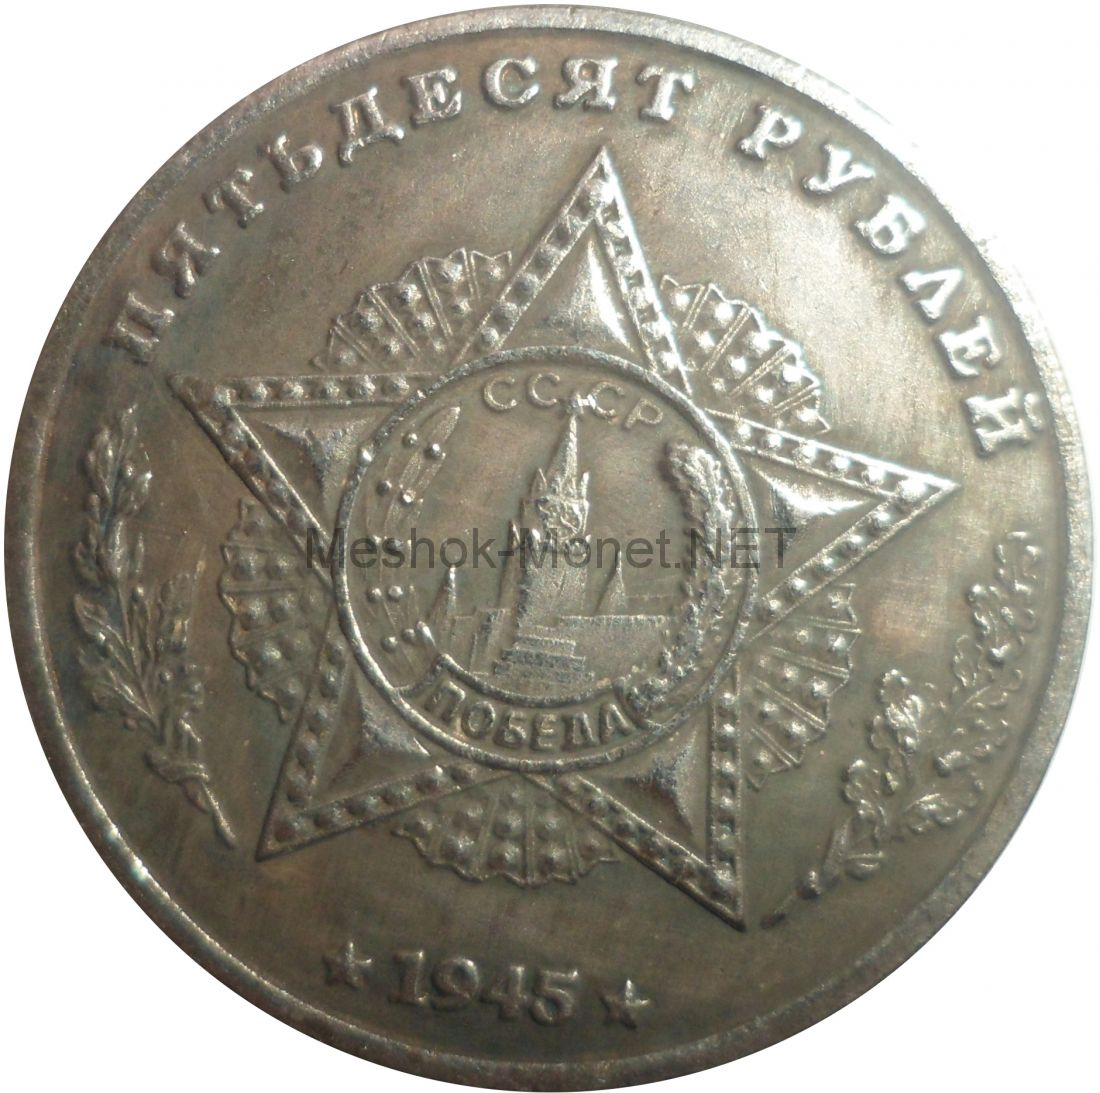 Копия 50 рублей 1945 года Б. Л. Монтгомери